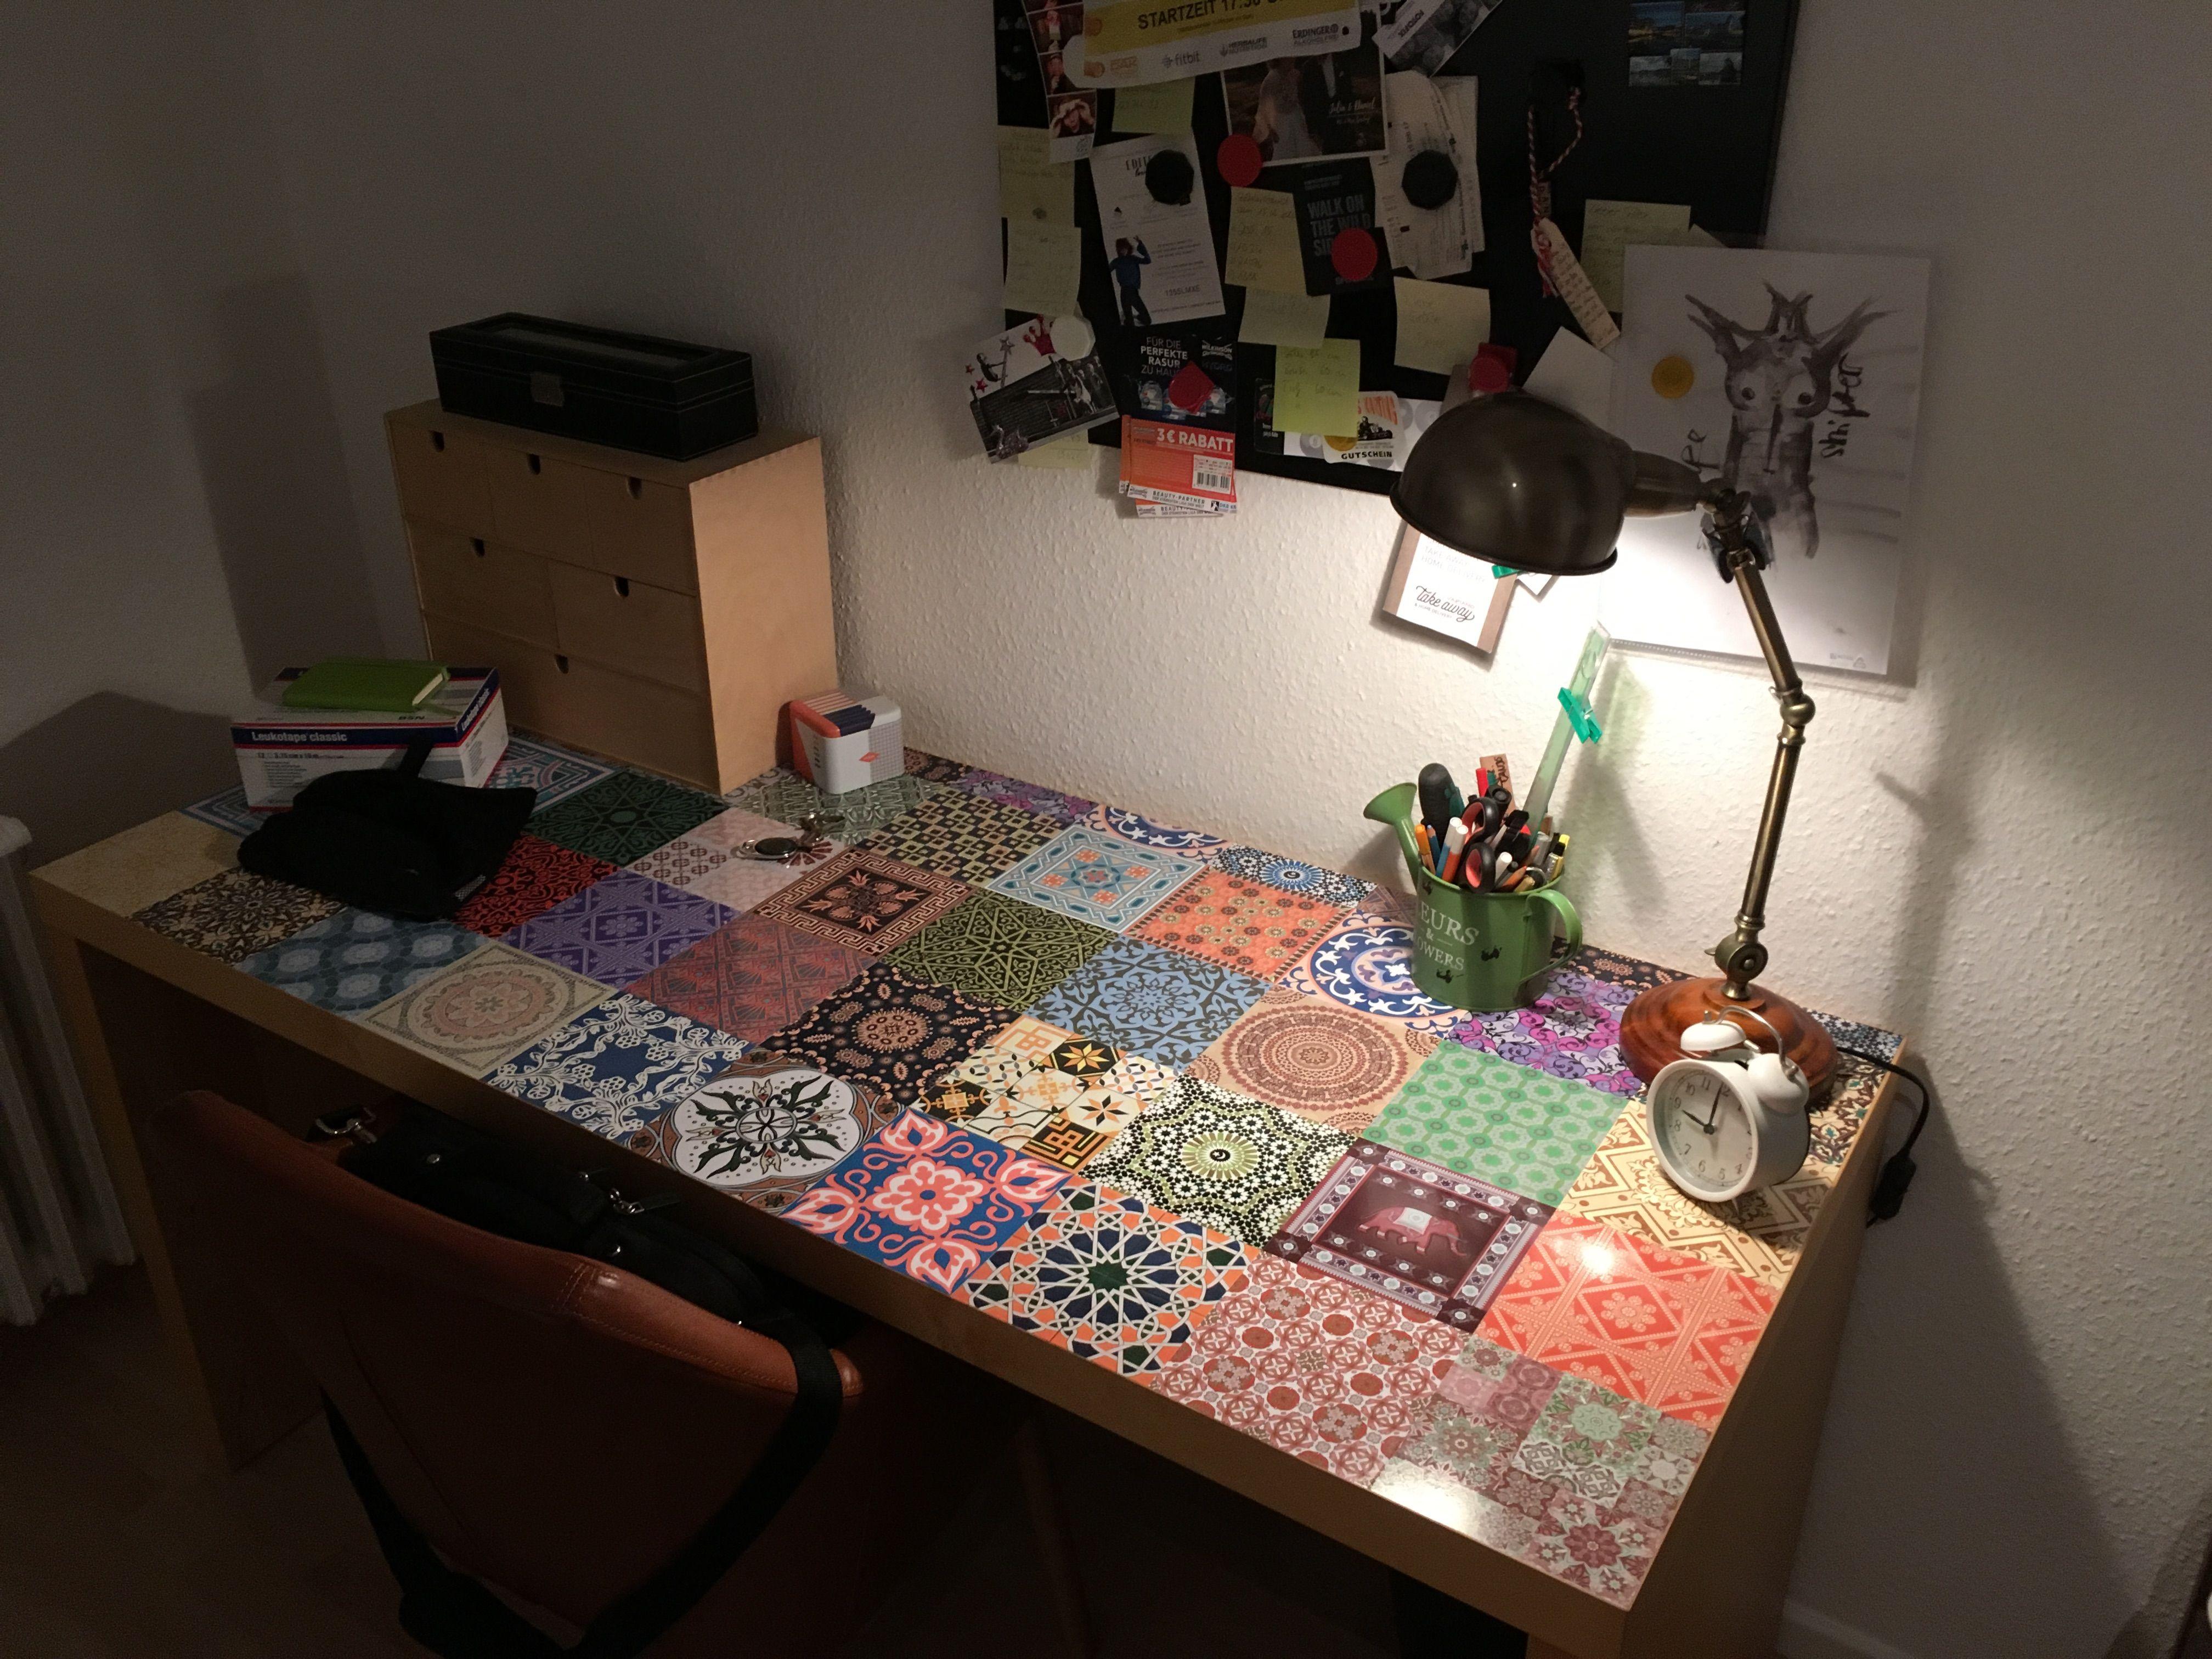 malm tisch trifft auf mosaikfolie // malm desk meets mosaic foil